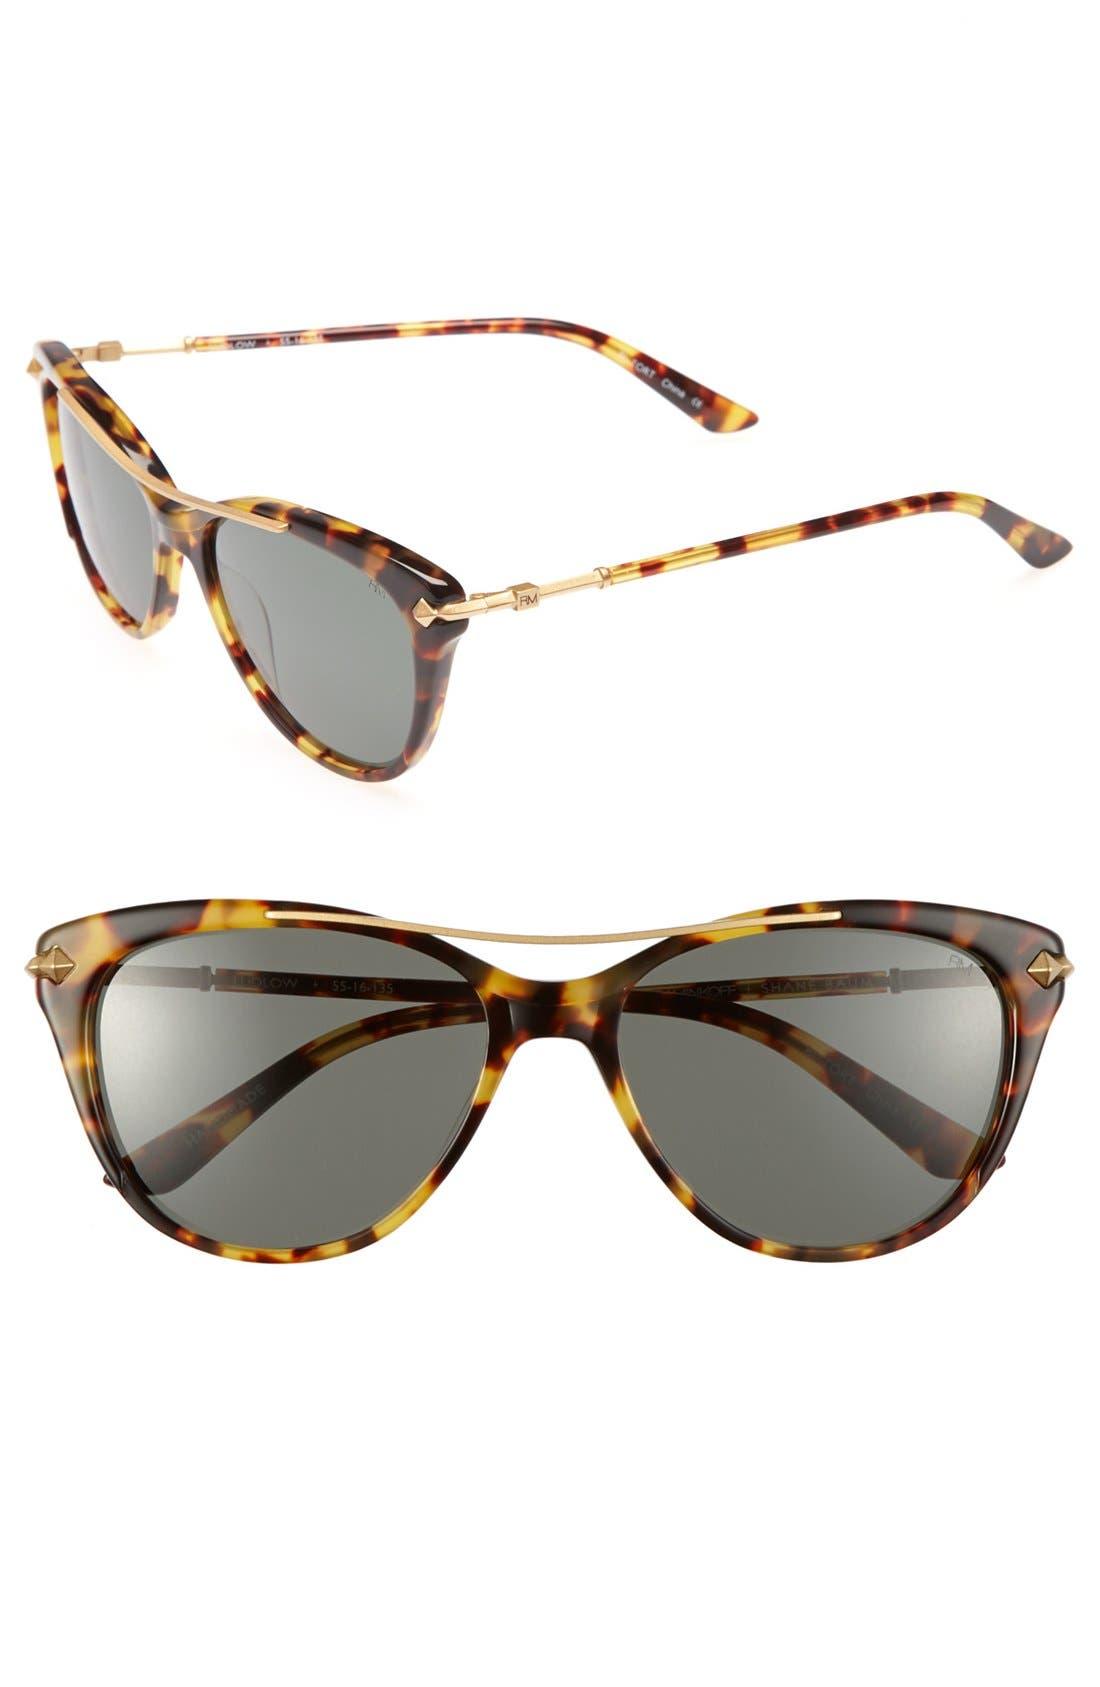 Alternate Image 1 Selected - Rebecca Minkoff 'Ludlow' 55mm Sunglasses